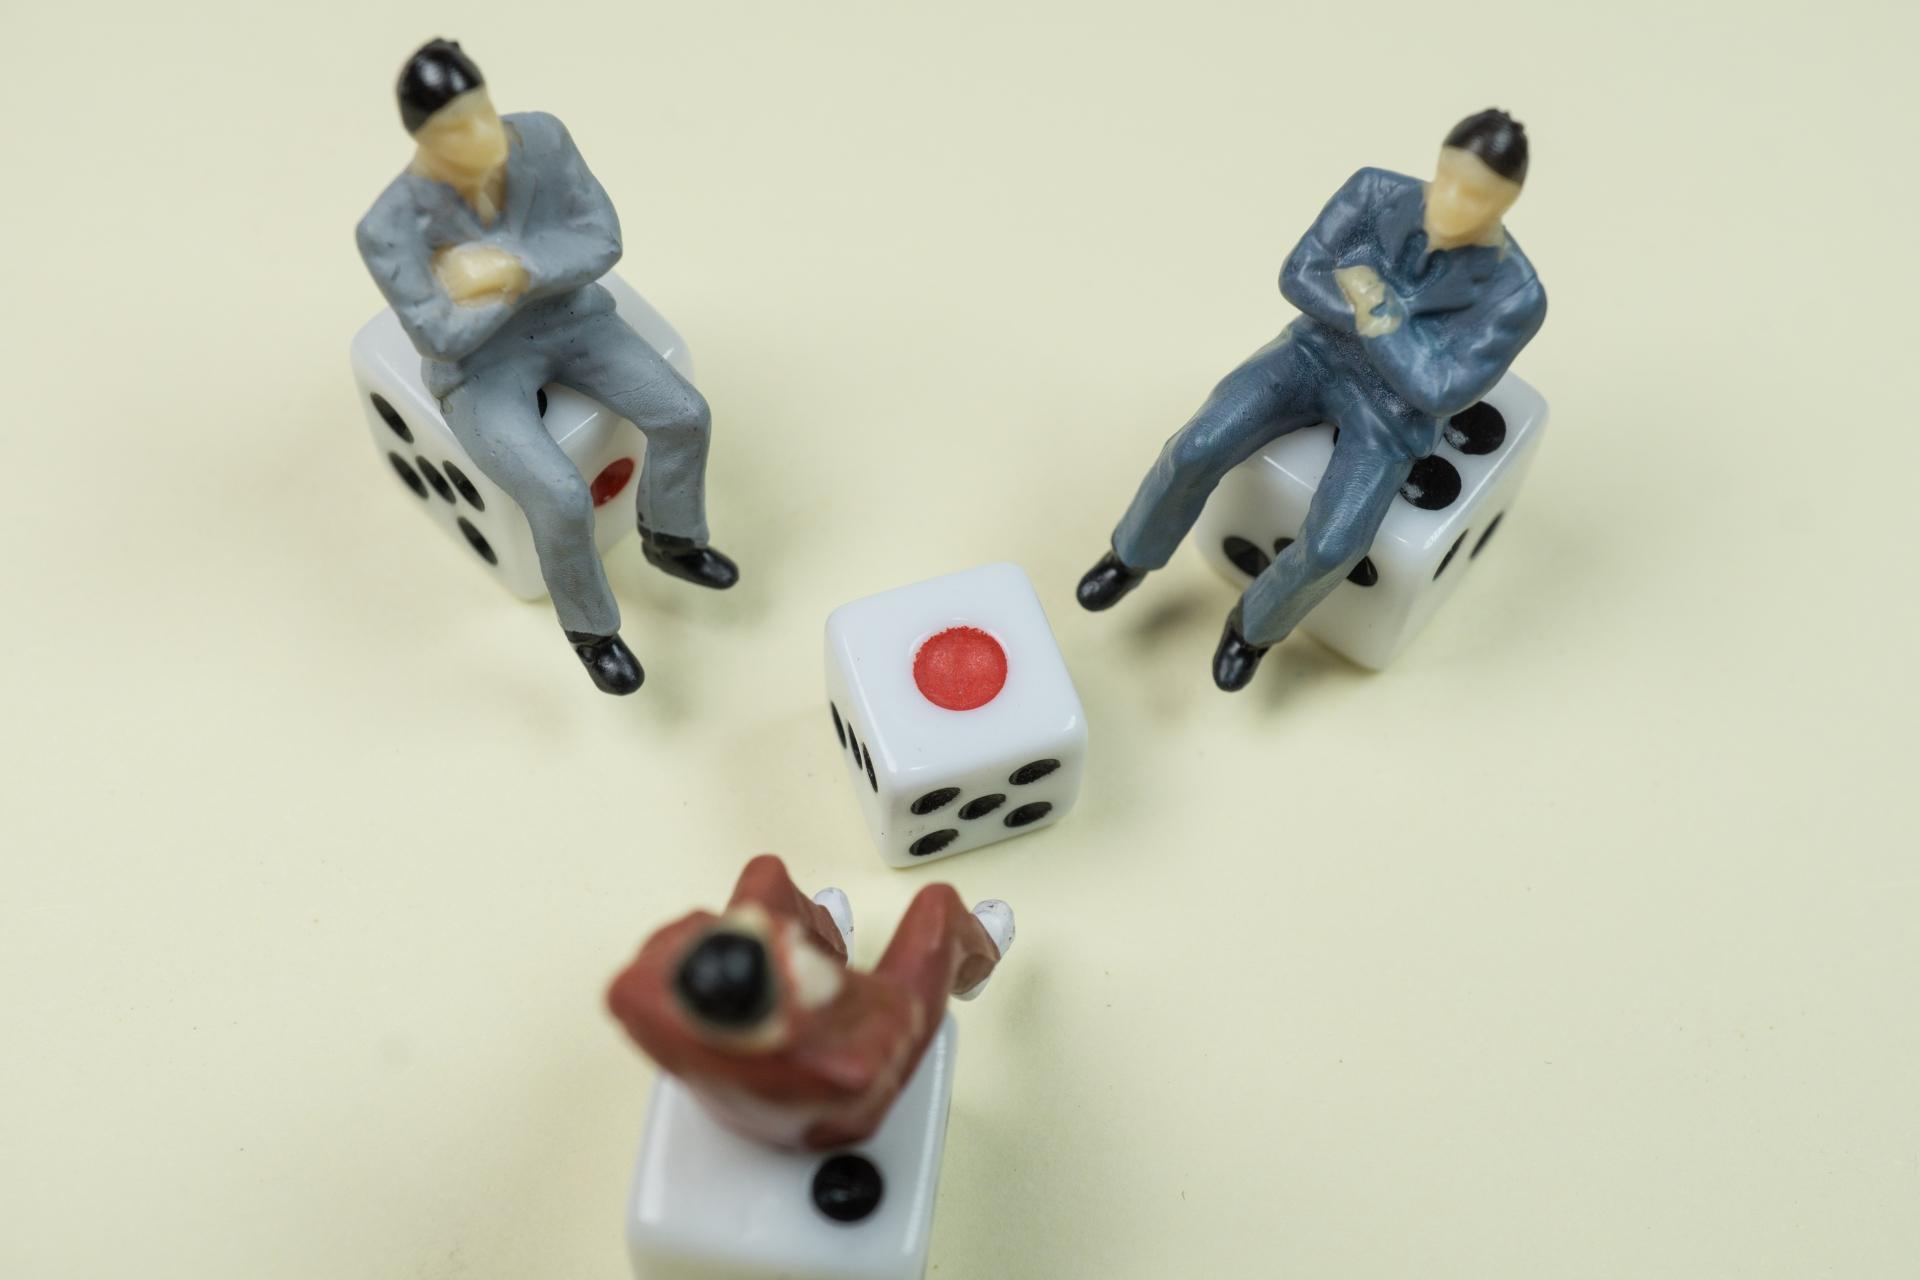 SBIHDと三井住友FGが業務提携。楽天証券買収は不発。メリットは?